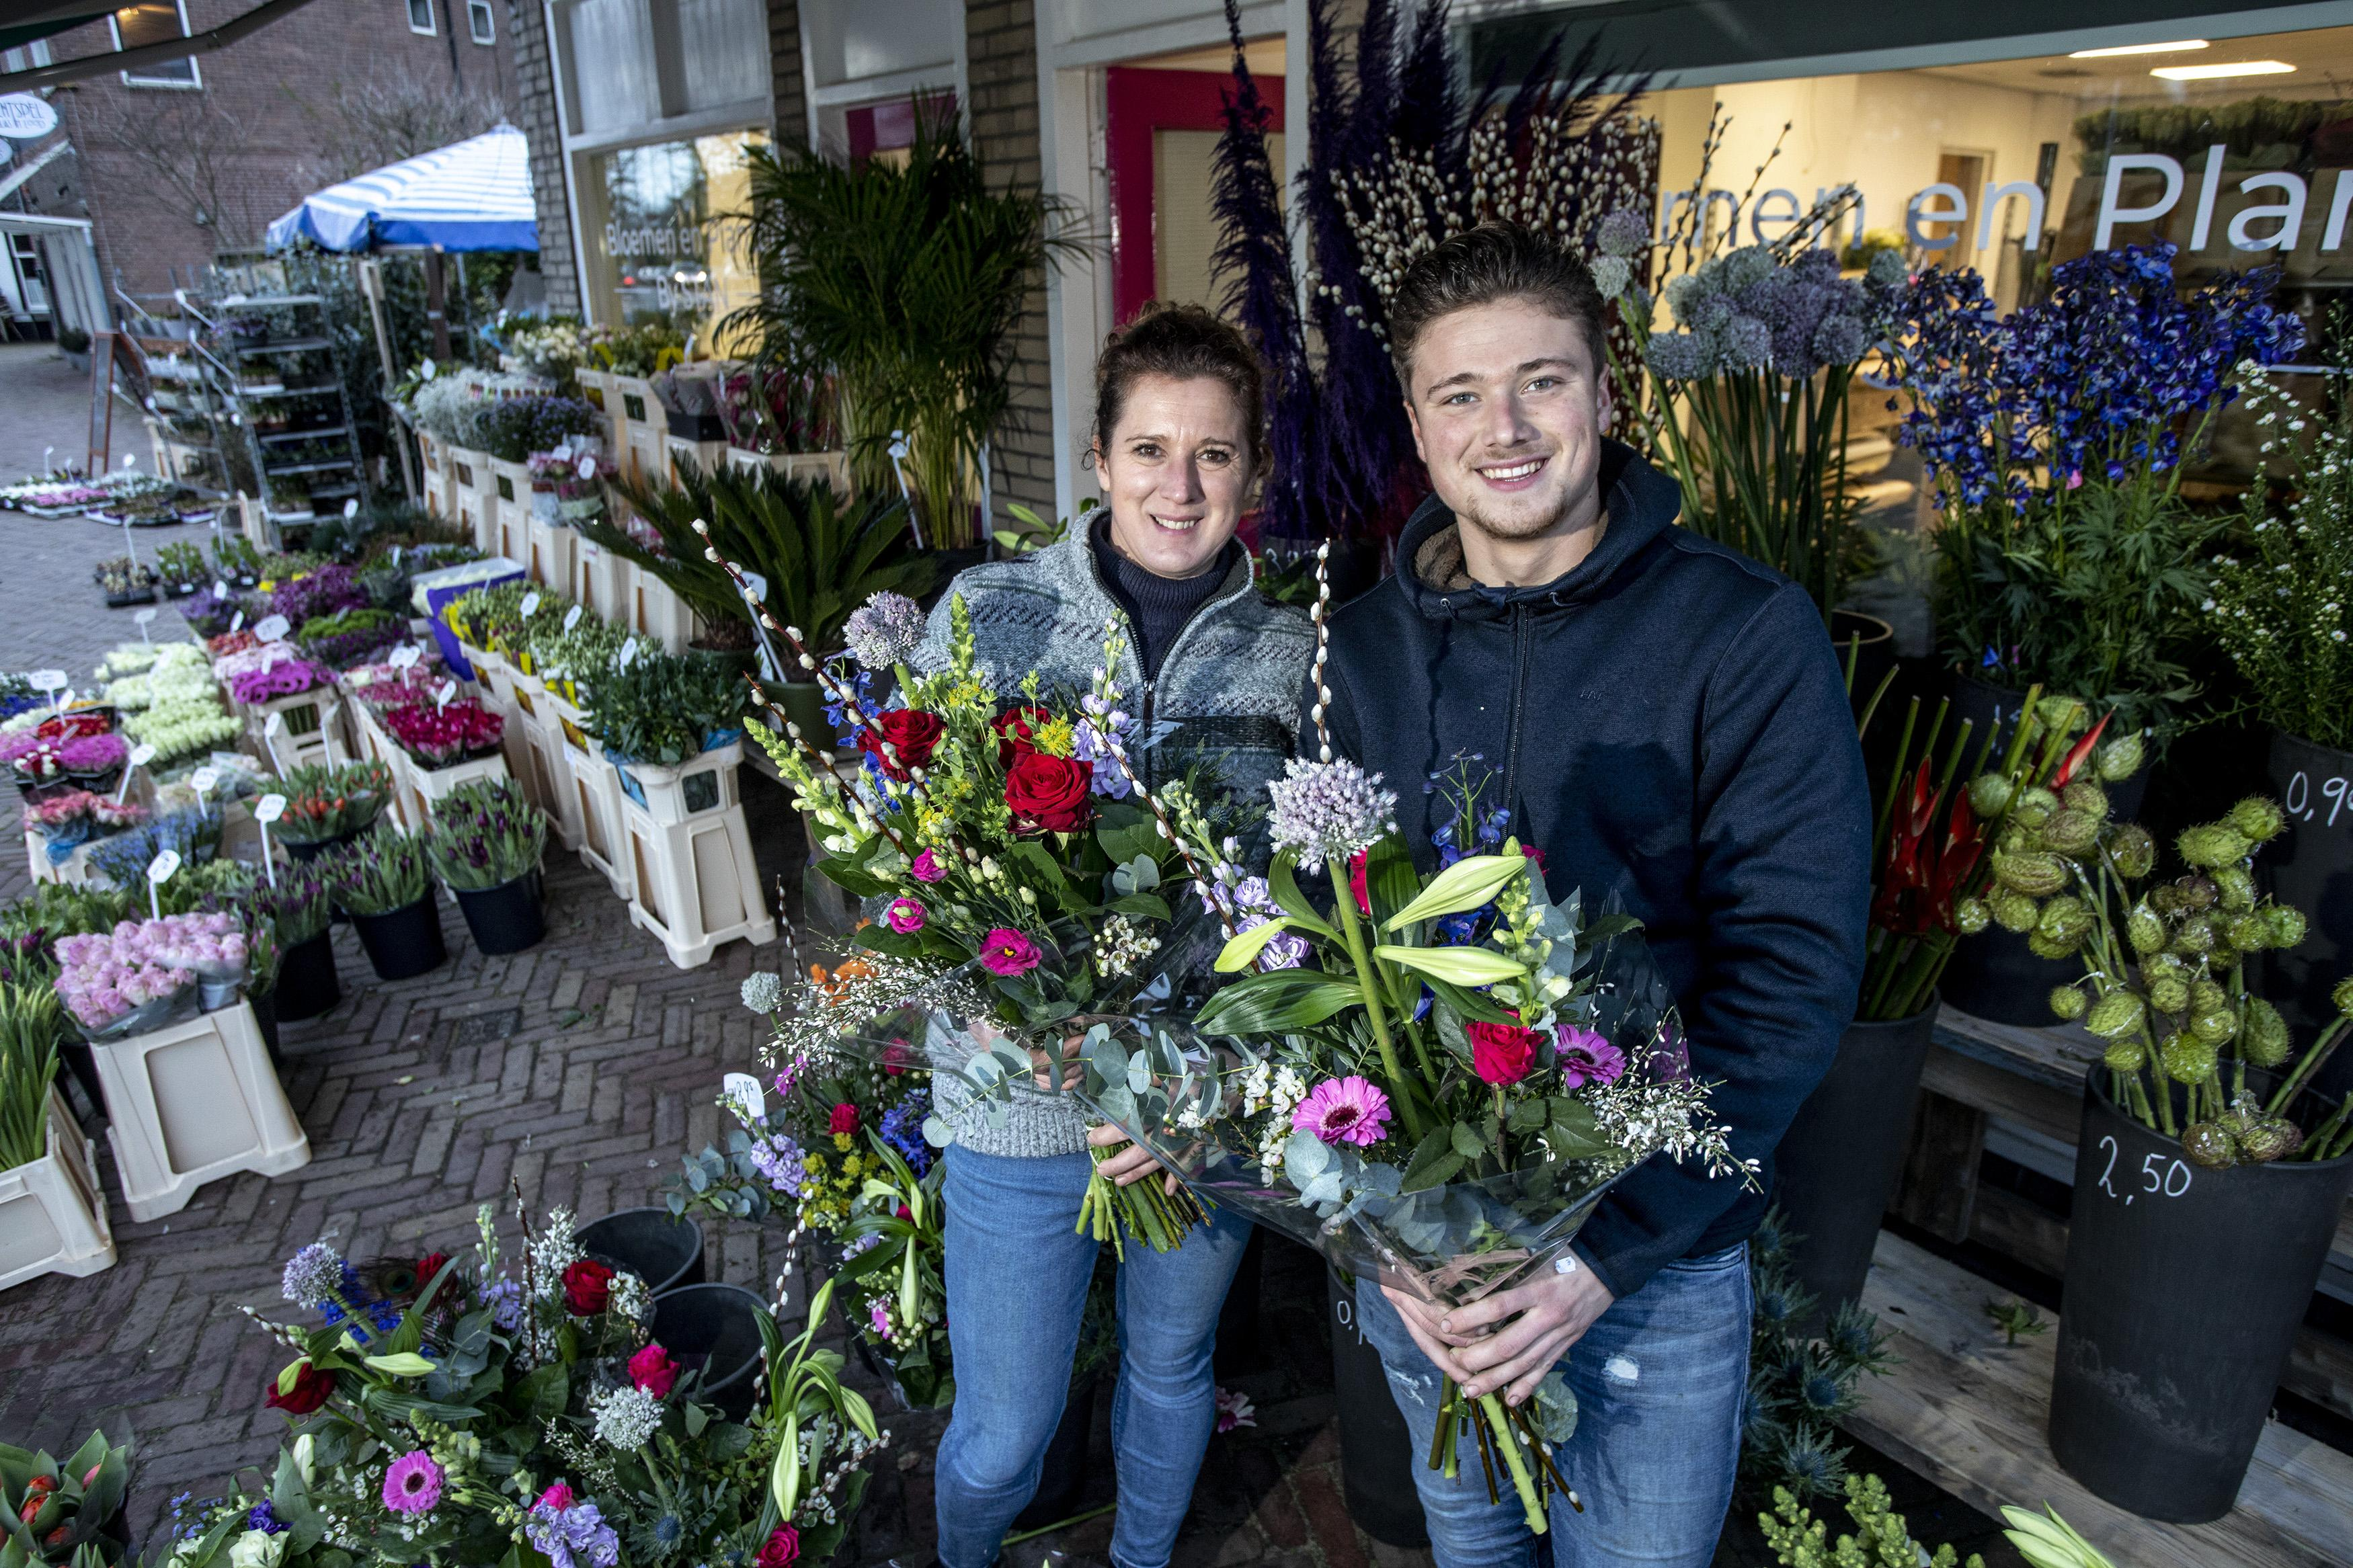 Droom komt uit voor 18-jarige ondernemer: nieuwe bloemenzaak in Santpoort-Noord